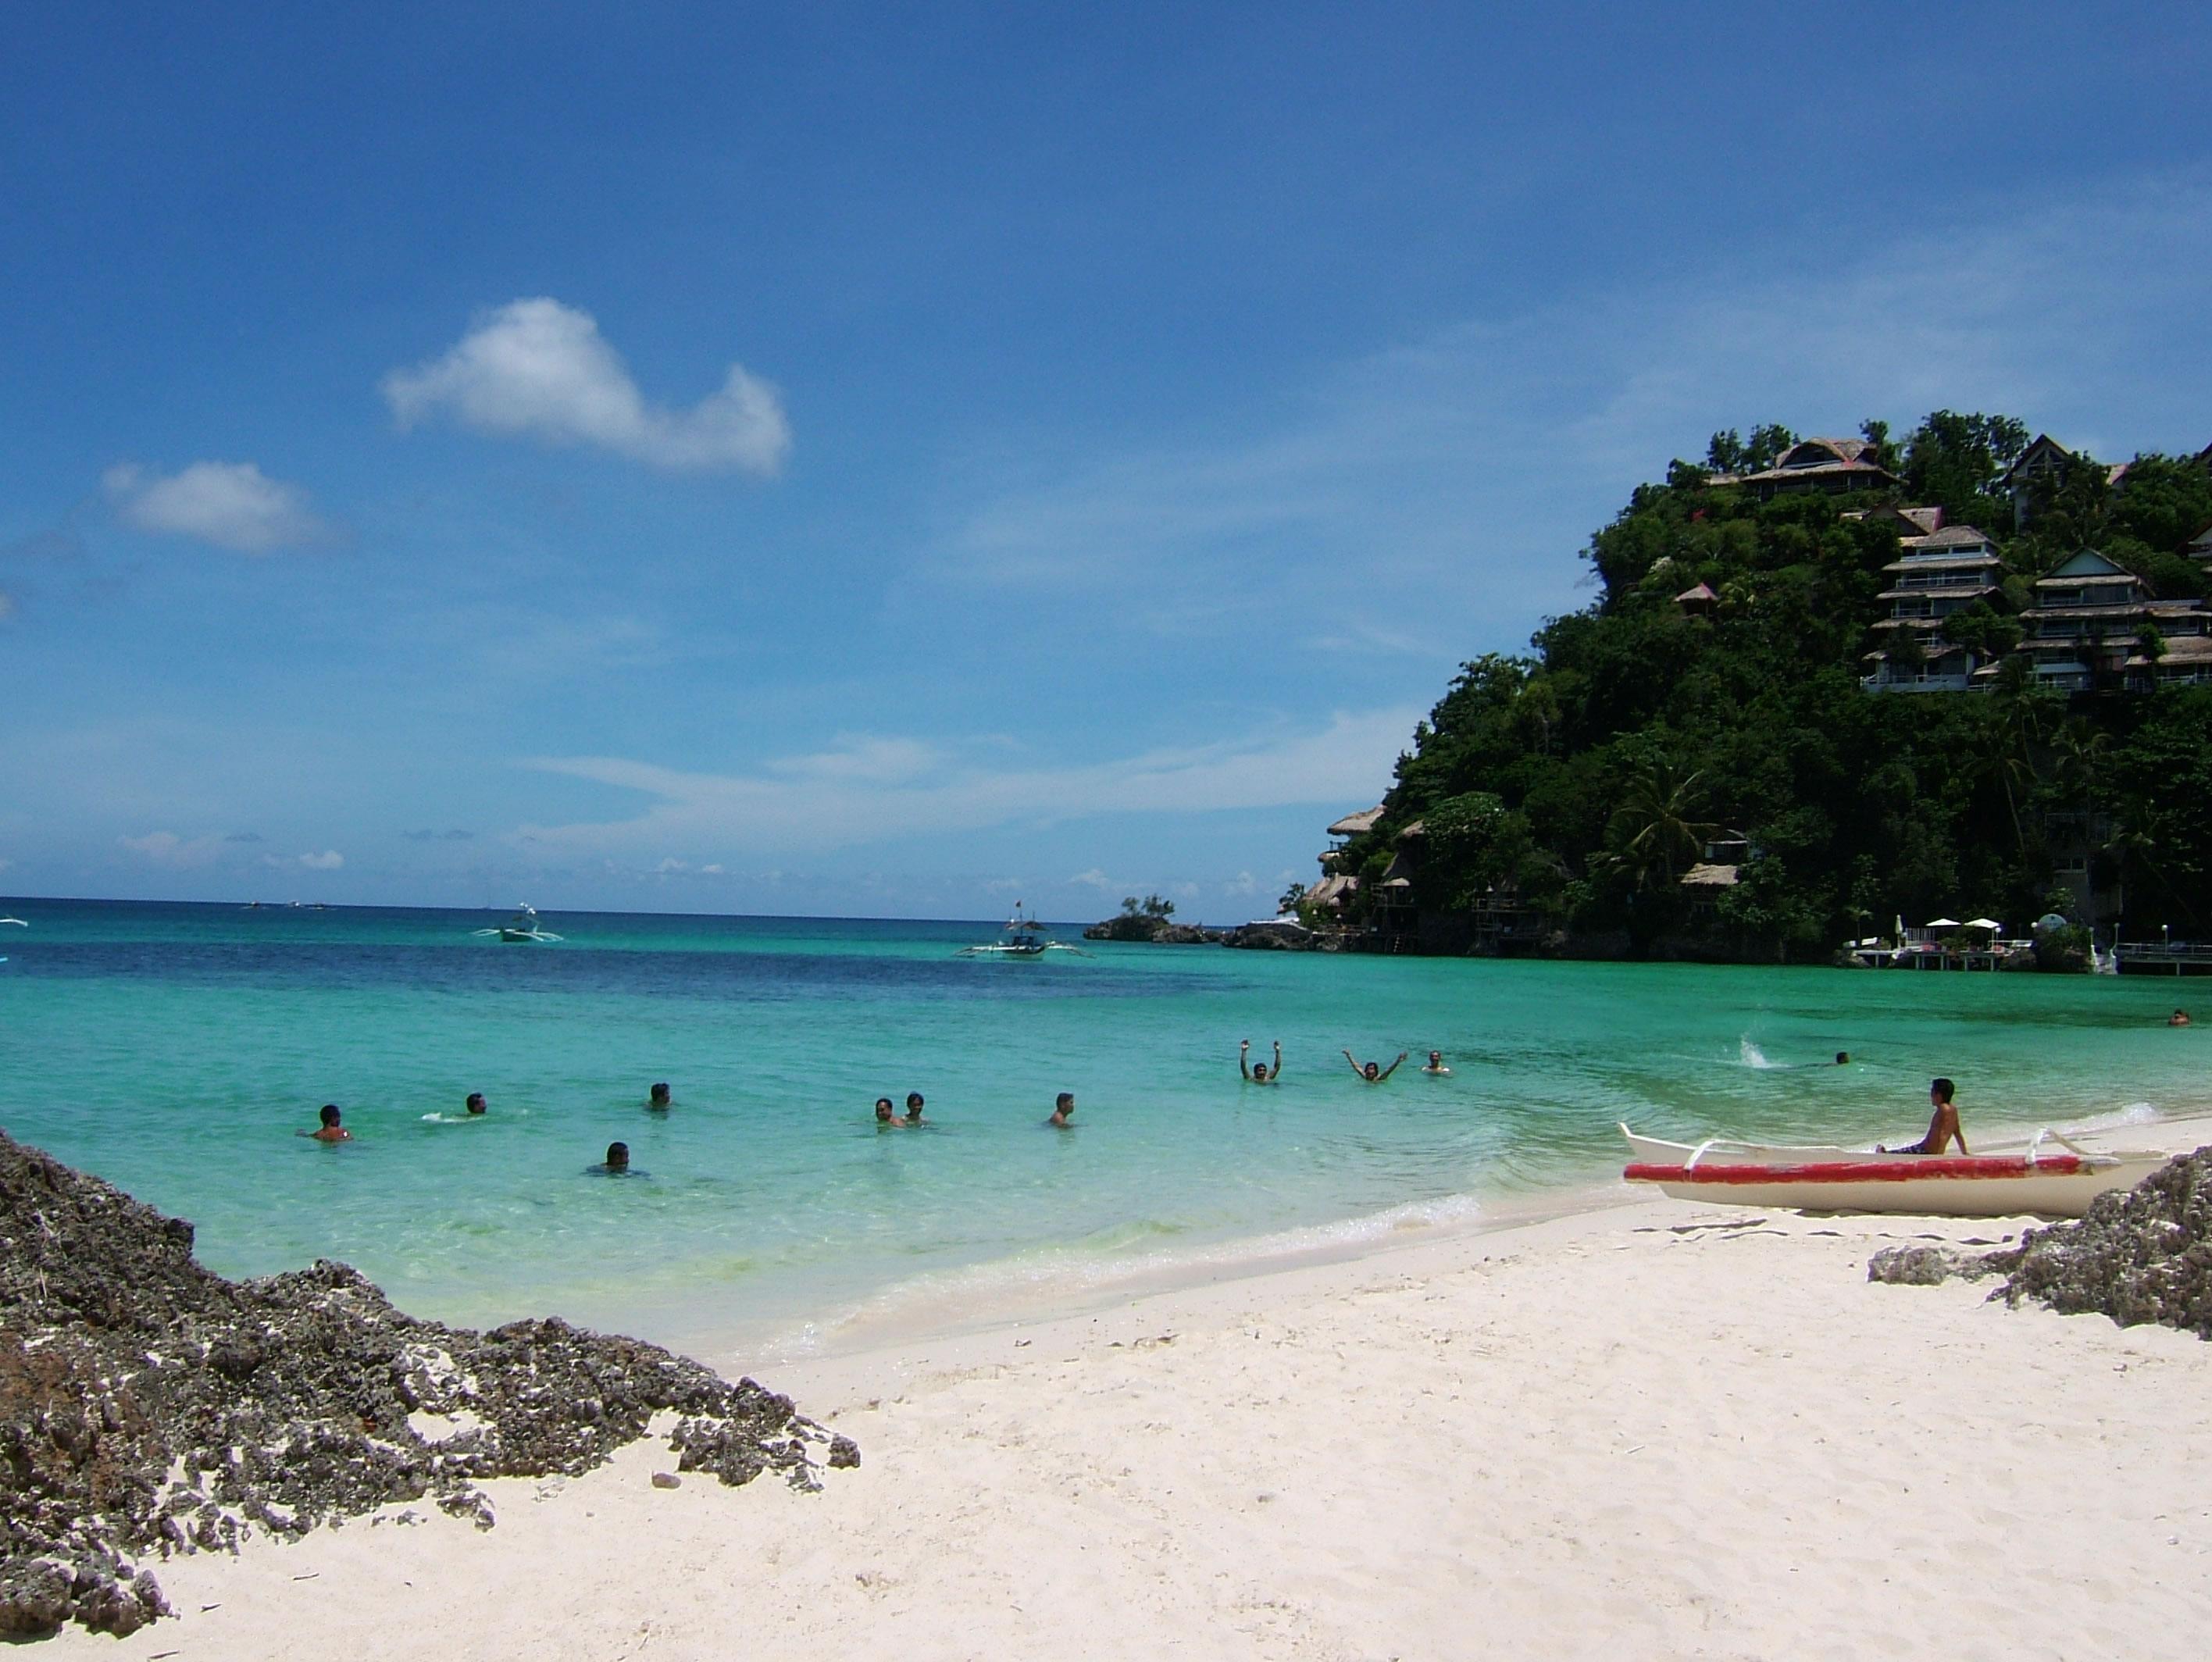 Philippines Sugar Islands Boracay Punta bunga beach Resorts 2007 06